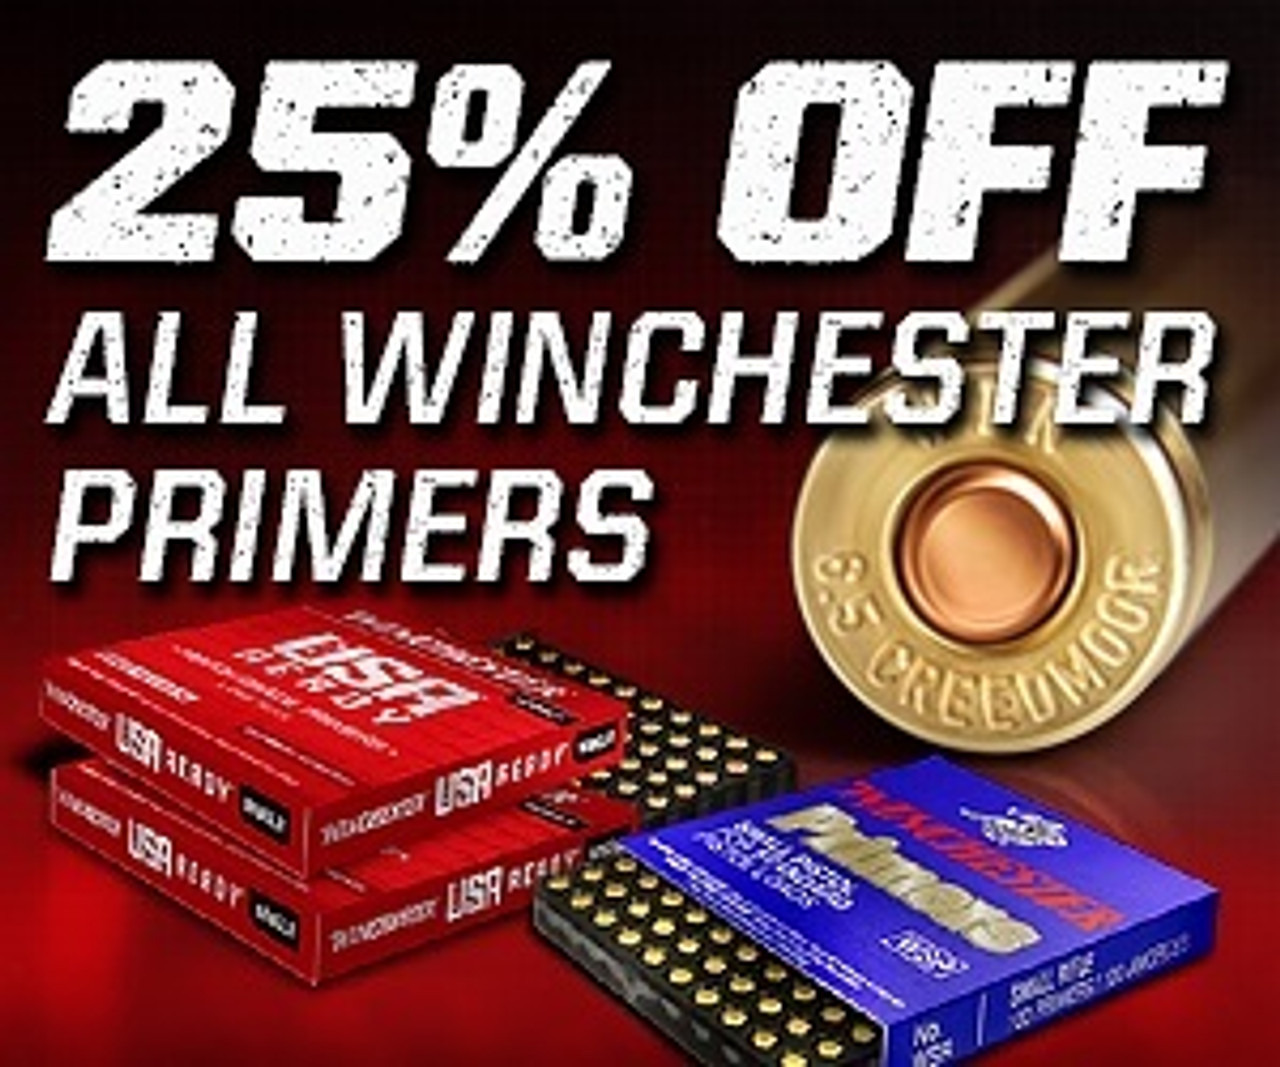 Winchester Primer Rebate